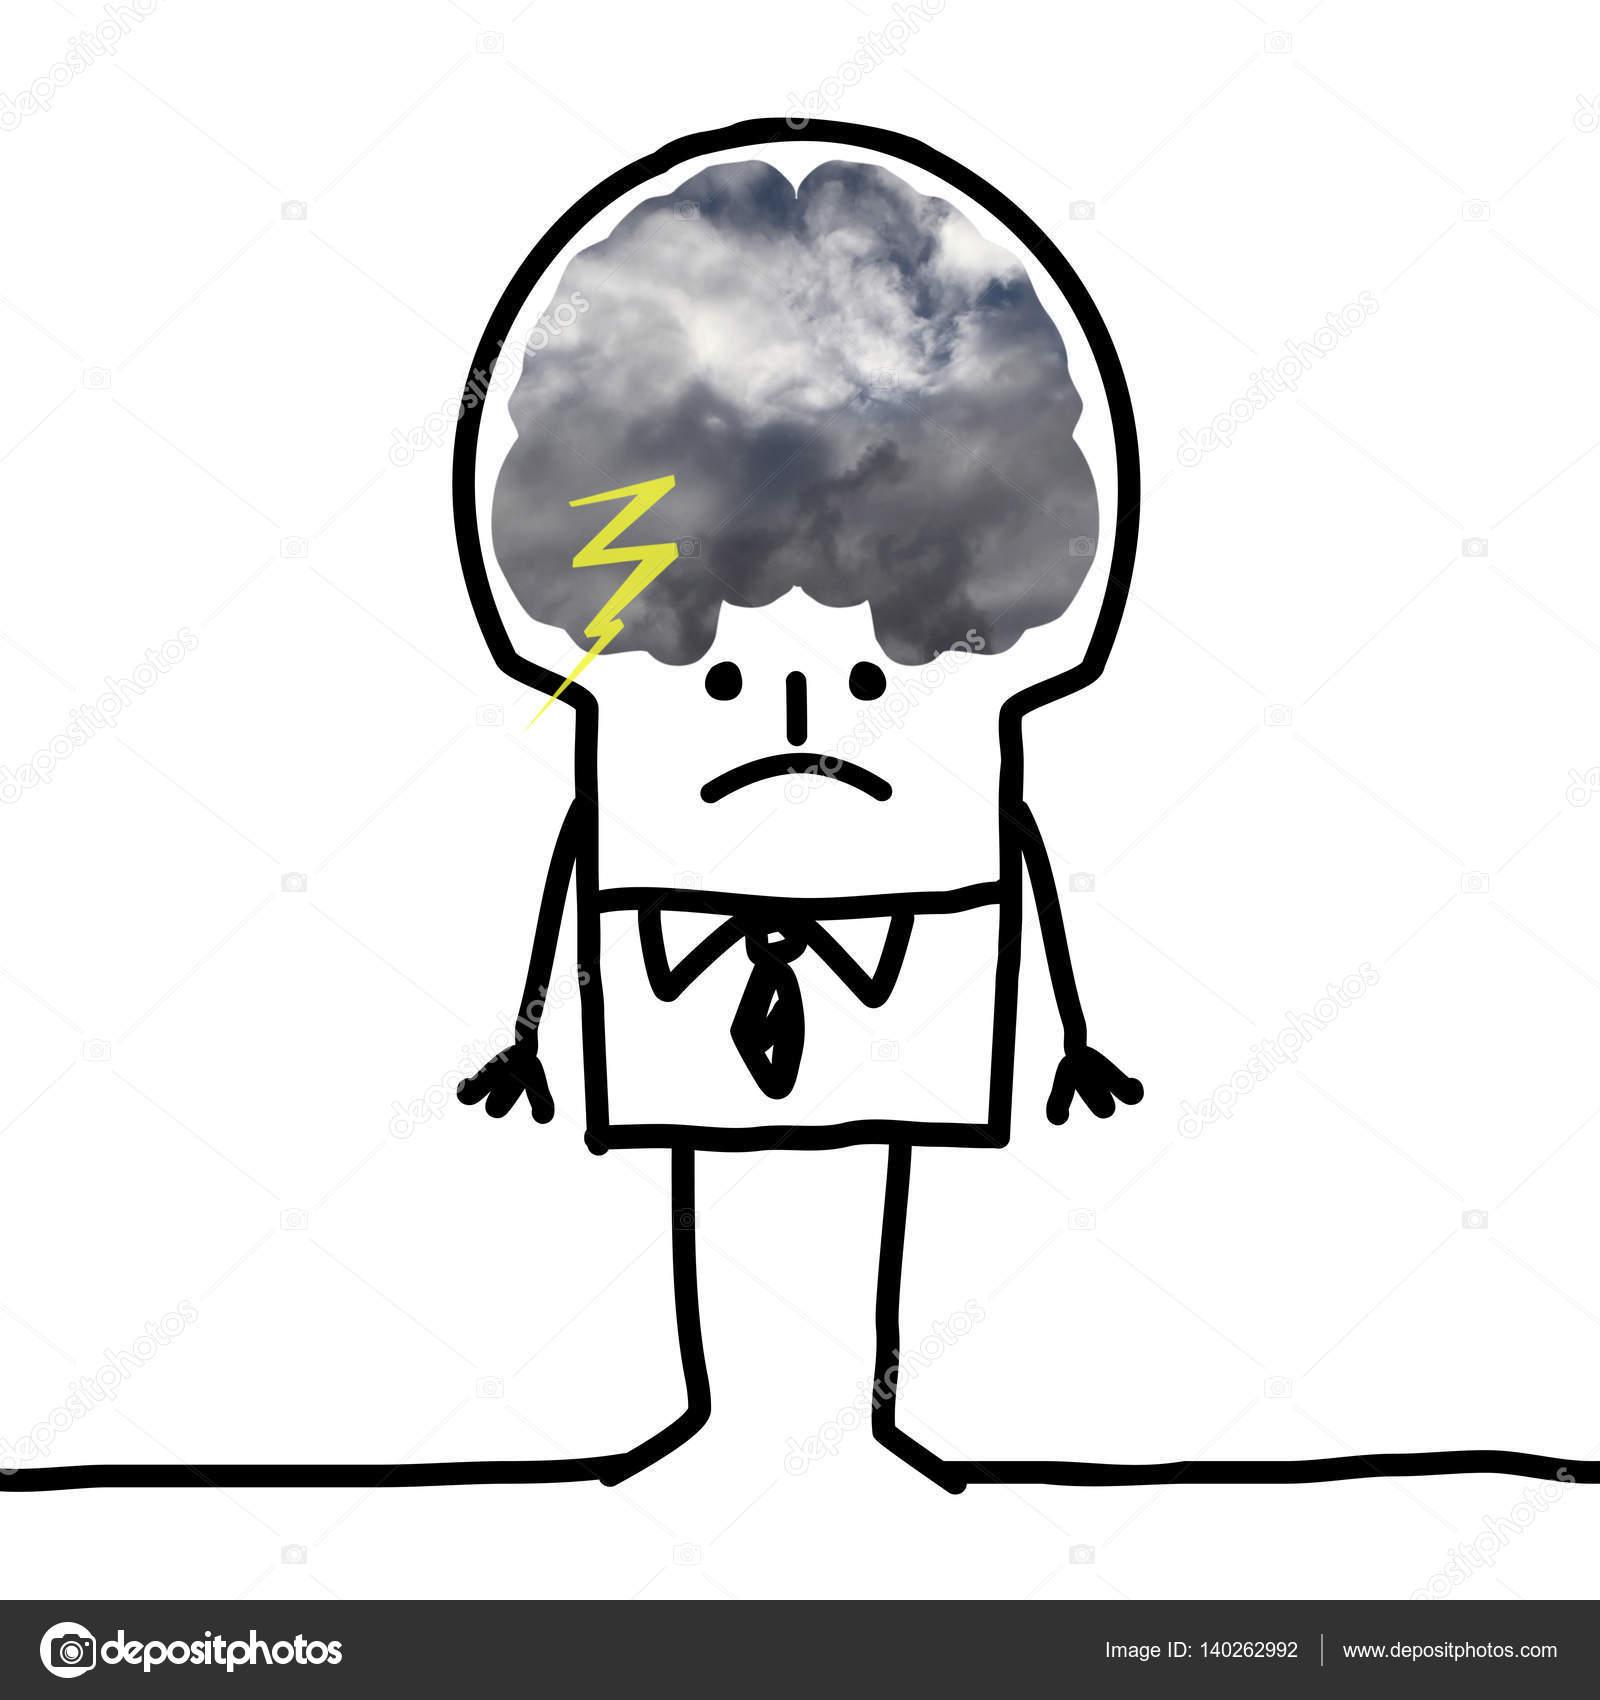 Cartoon big brain man pessimism and clouds stock photo nlshop cartoon big brain man pessimism and clouds photo by nlshop thecheapjerseys Gallery